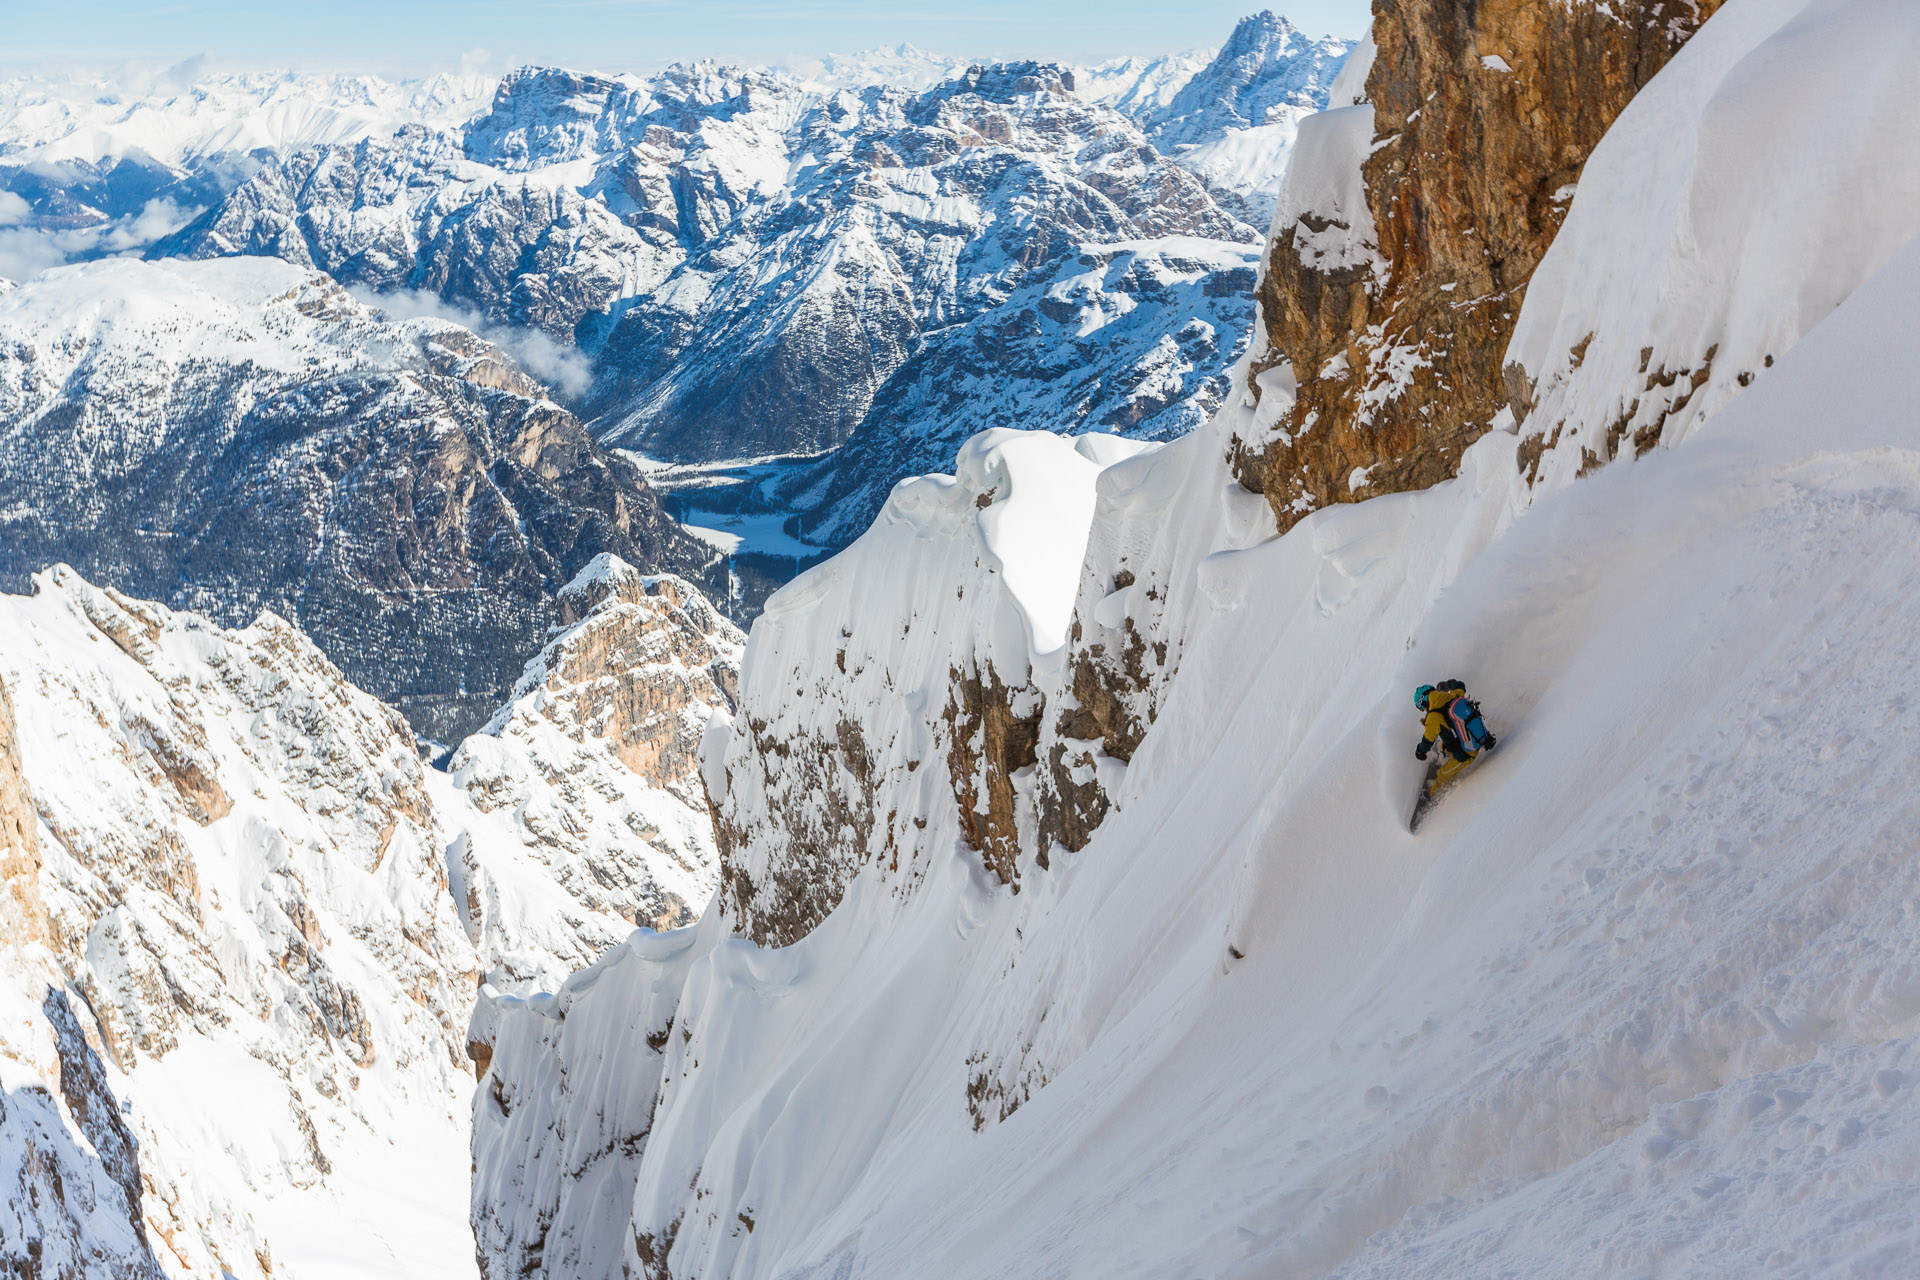 Bibi Pekarek drops into Staunies couloir in the Dolomites